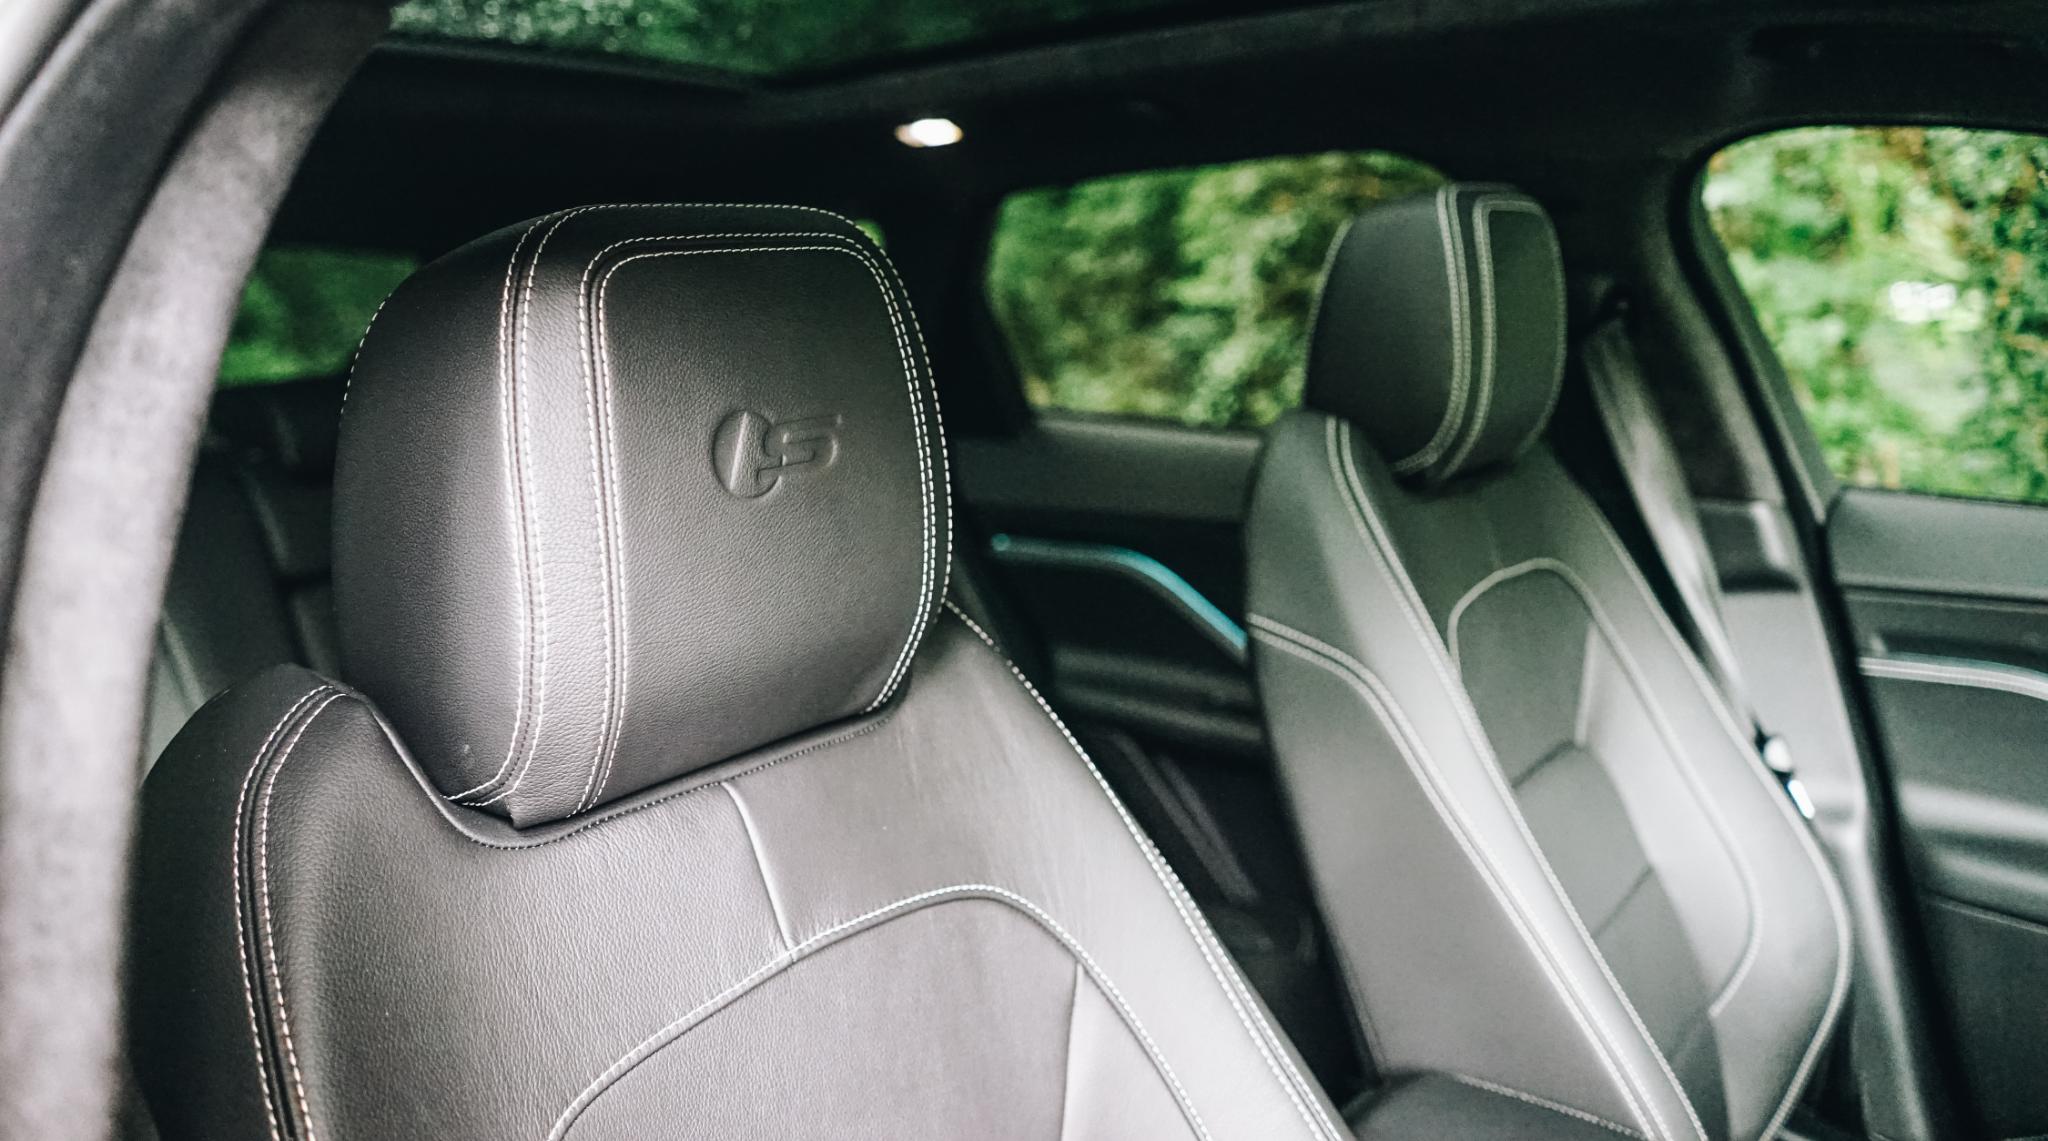 Jaguar F PACE Interior Front Seats Into Rear